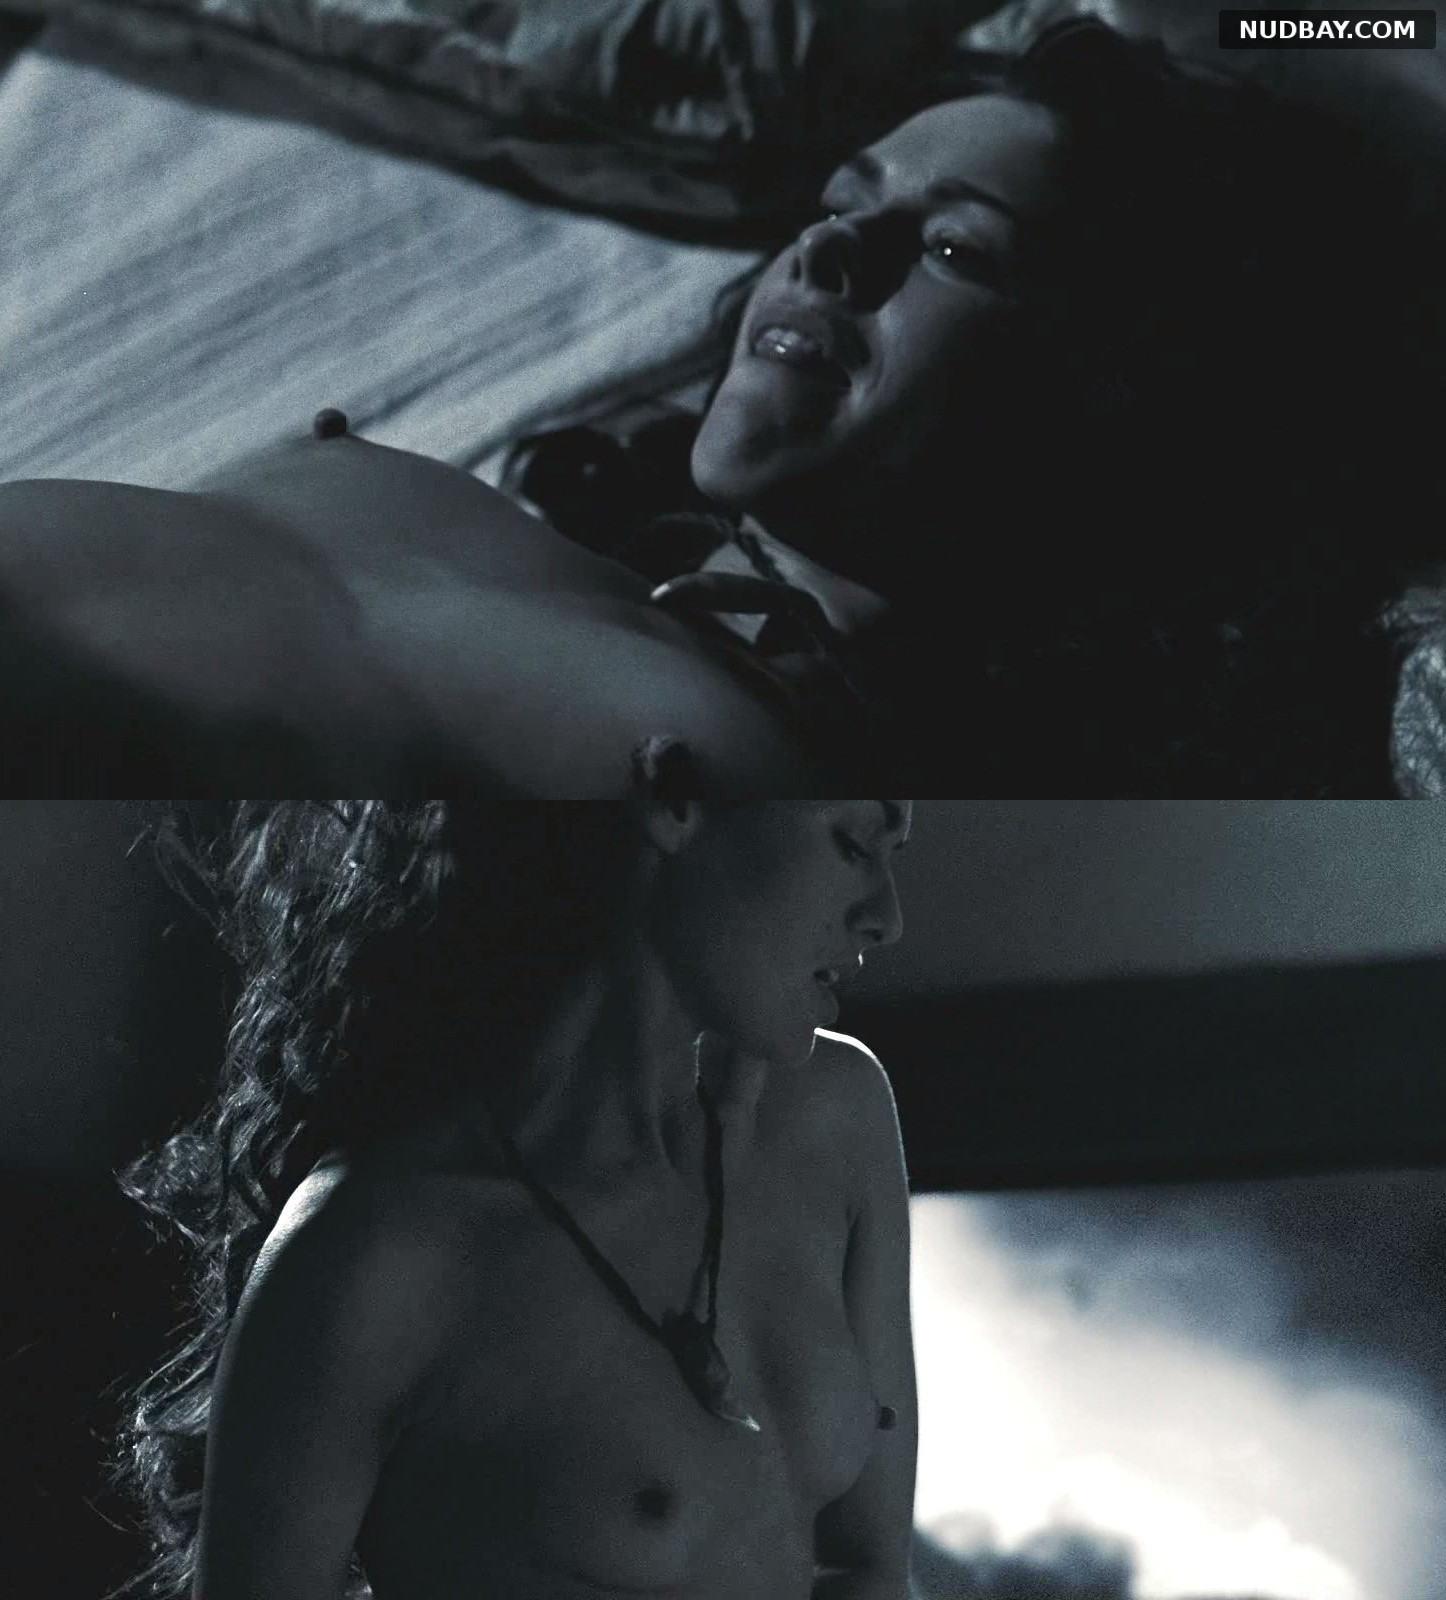 Lena Headey nude in 300 (2007)